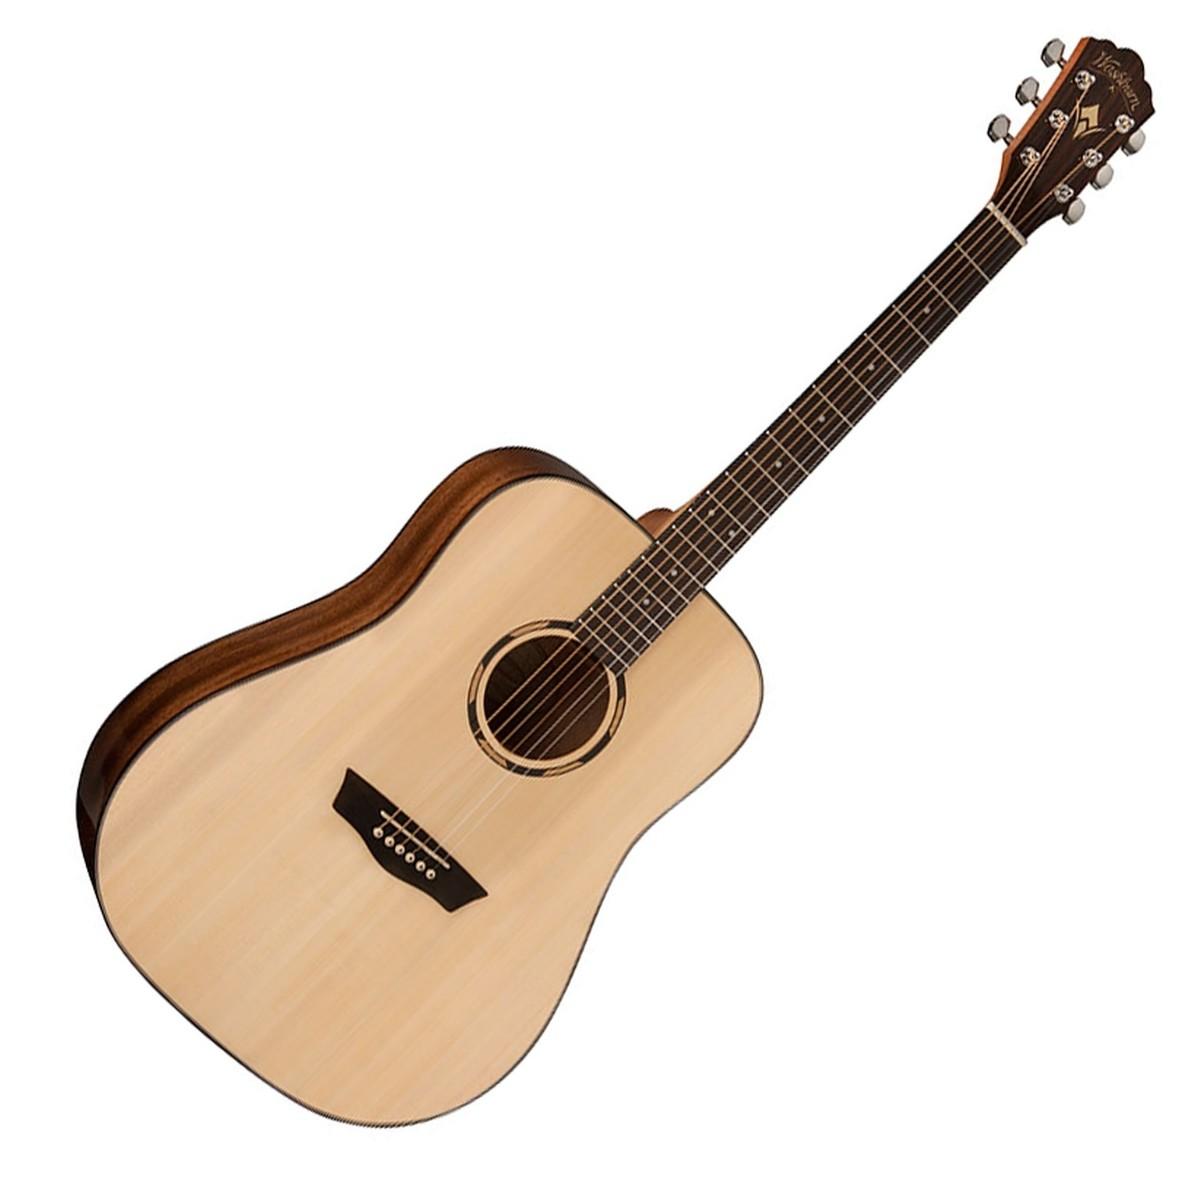 Washburn gitarer dating